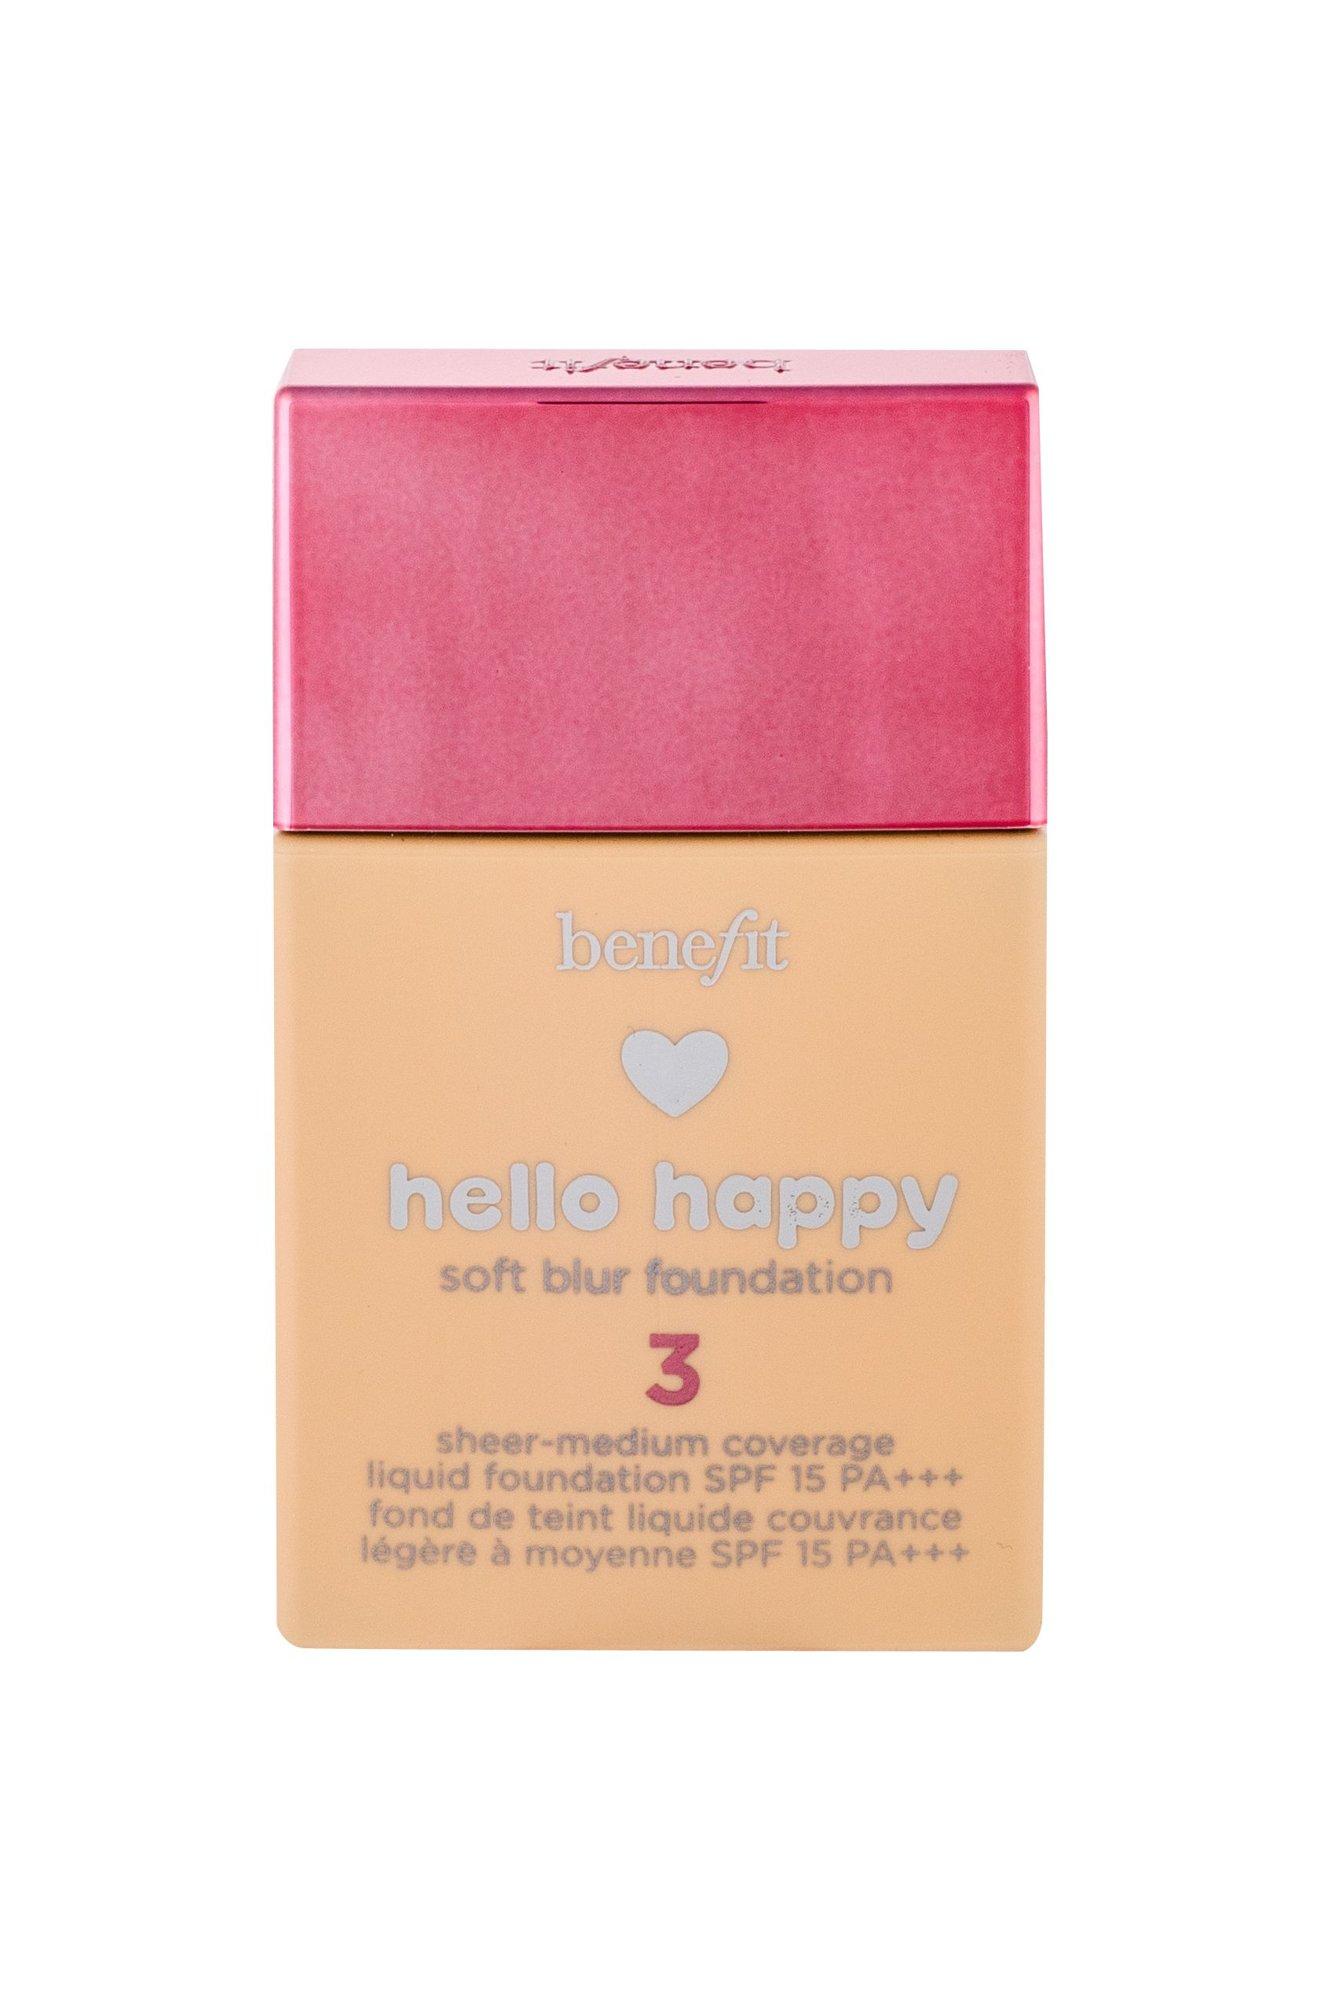 Benefit Hello Happy Makeup 30ml 03 Light Neutral